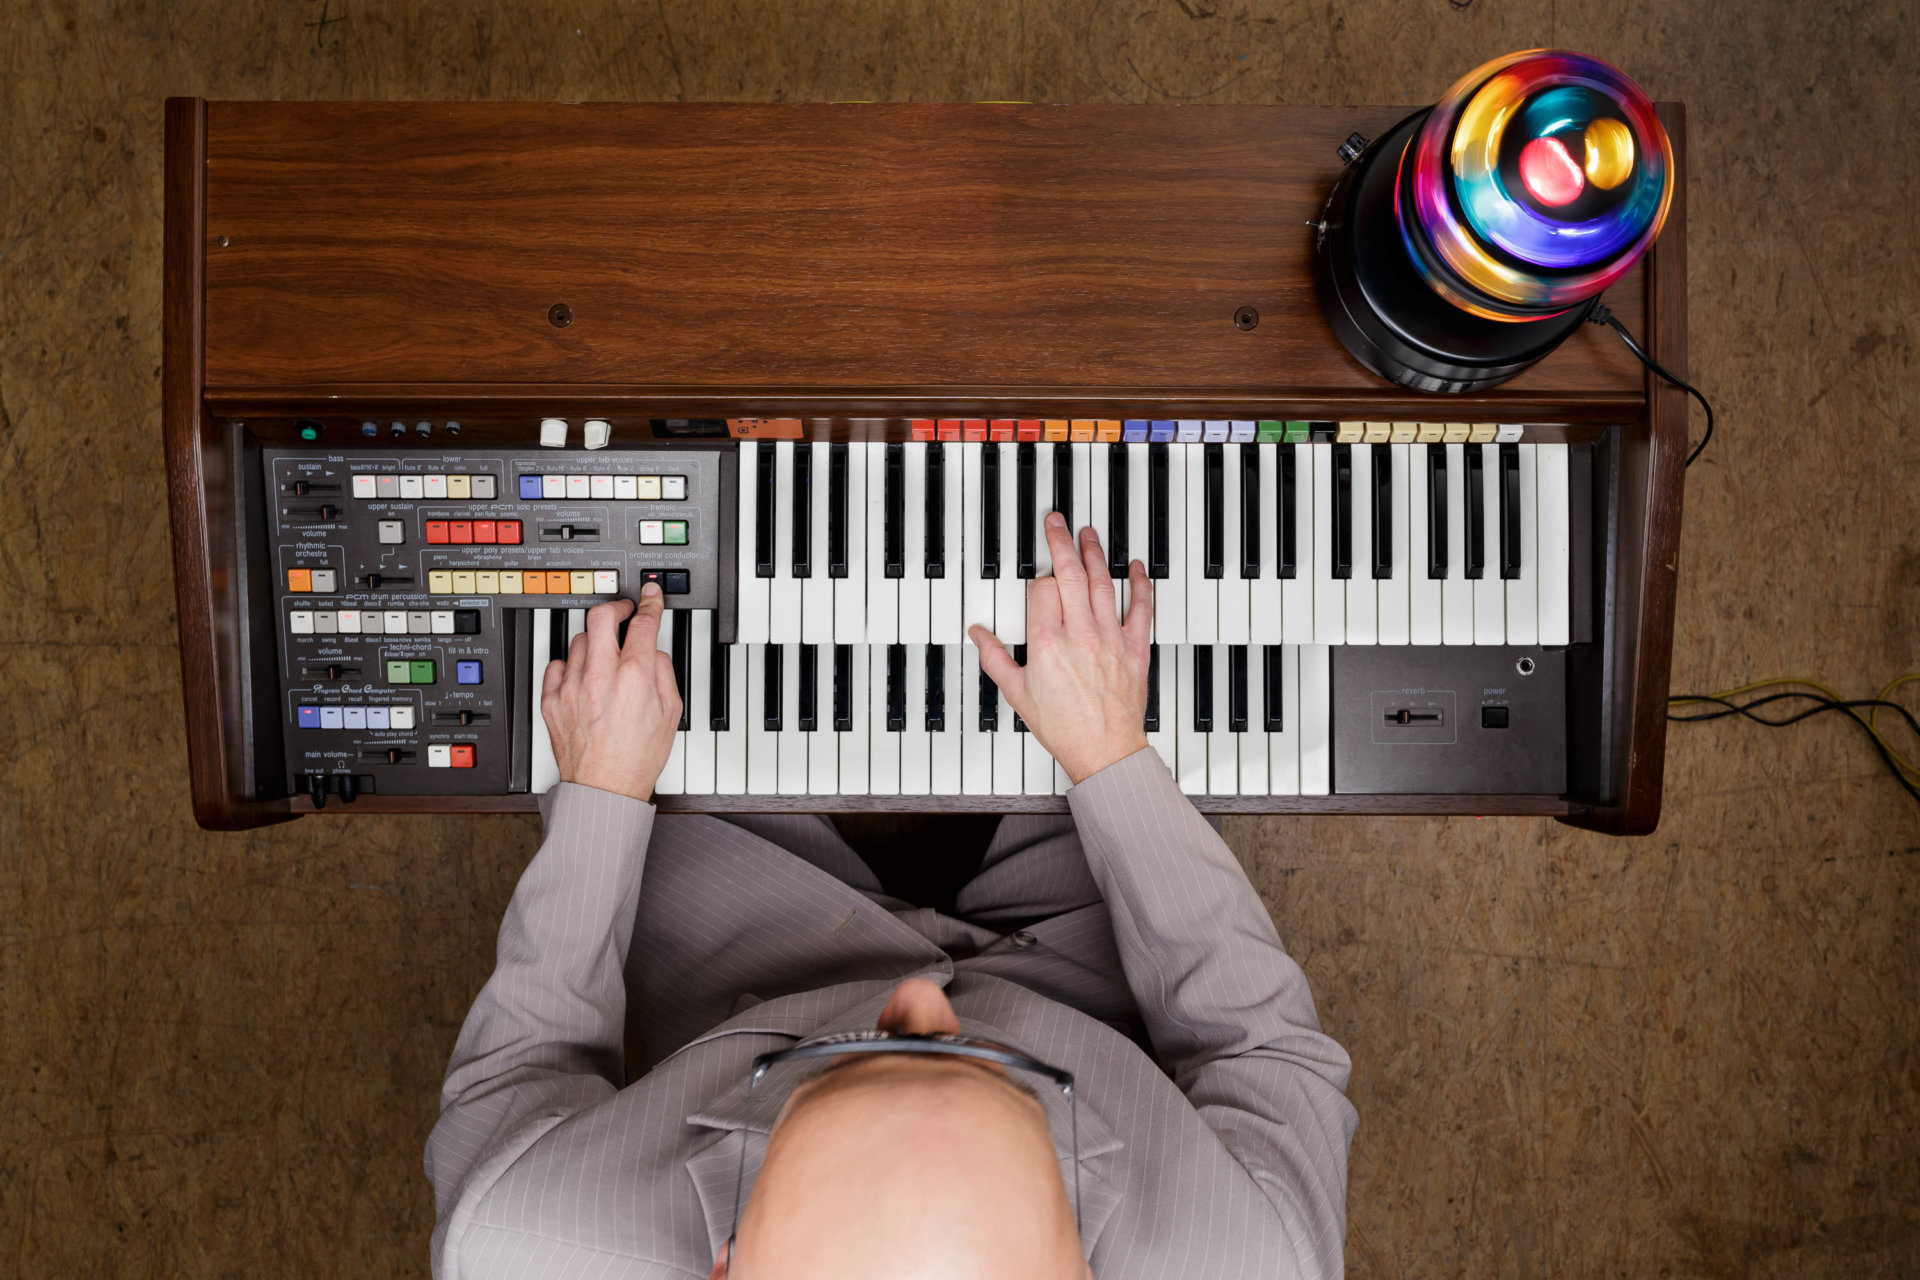 DRUCKEN!, Hände, Kultur, MASTERBILD, Pianist, Porträt, Projekt, Serie, klavier, konzert, mambo kurt, meisterfinger, musik, musiker, piano, tasten